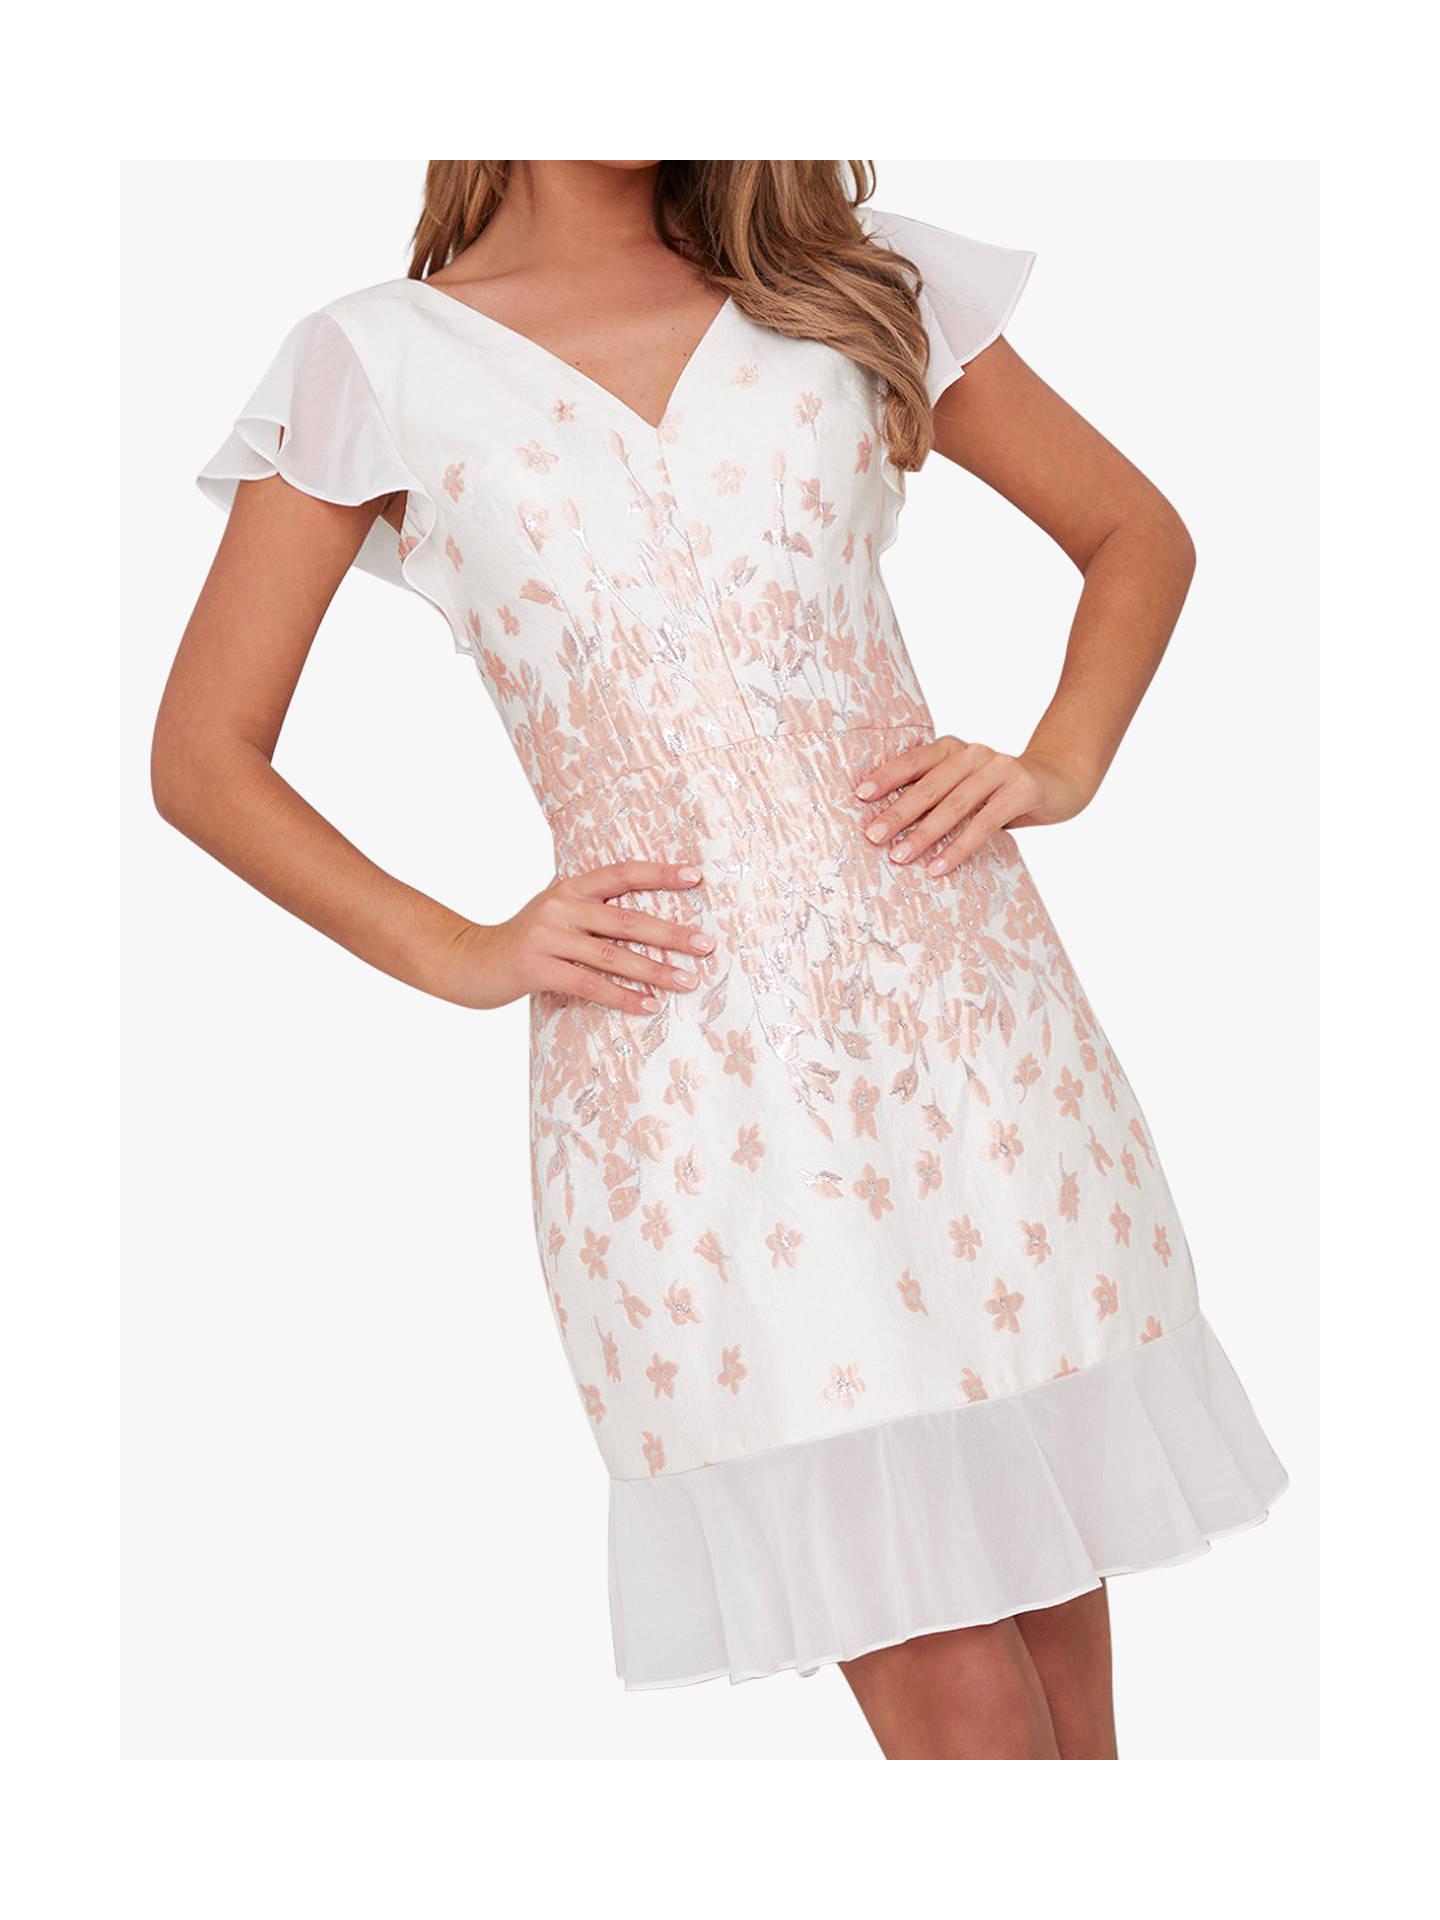 487584b0c5 Chi Chi London Nelley Metallic Embroidered Dress, White